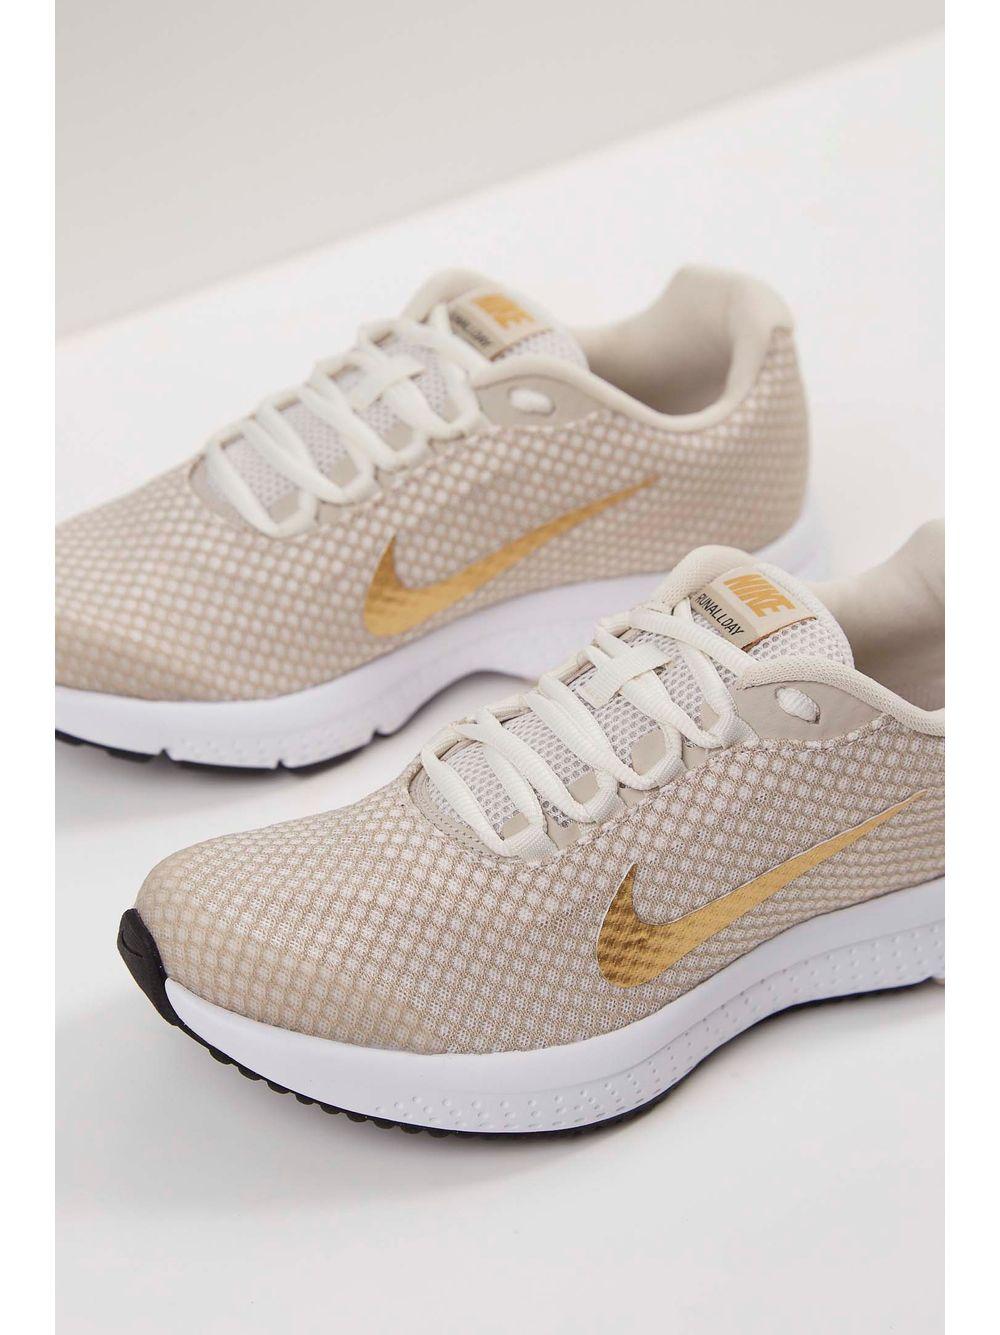 bfddbf1327e Tênis Nike Runallday Textorizado Feminino Feminino Textorizado Bege pittol  277e5d